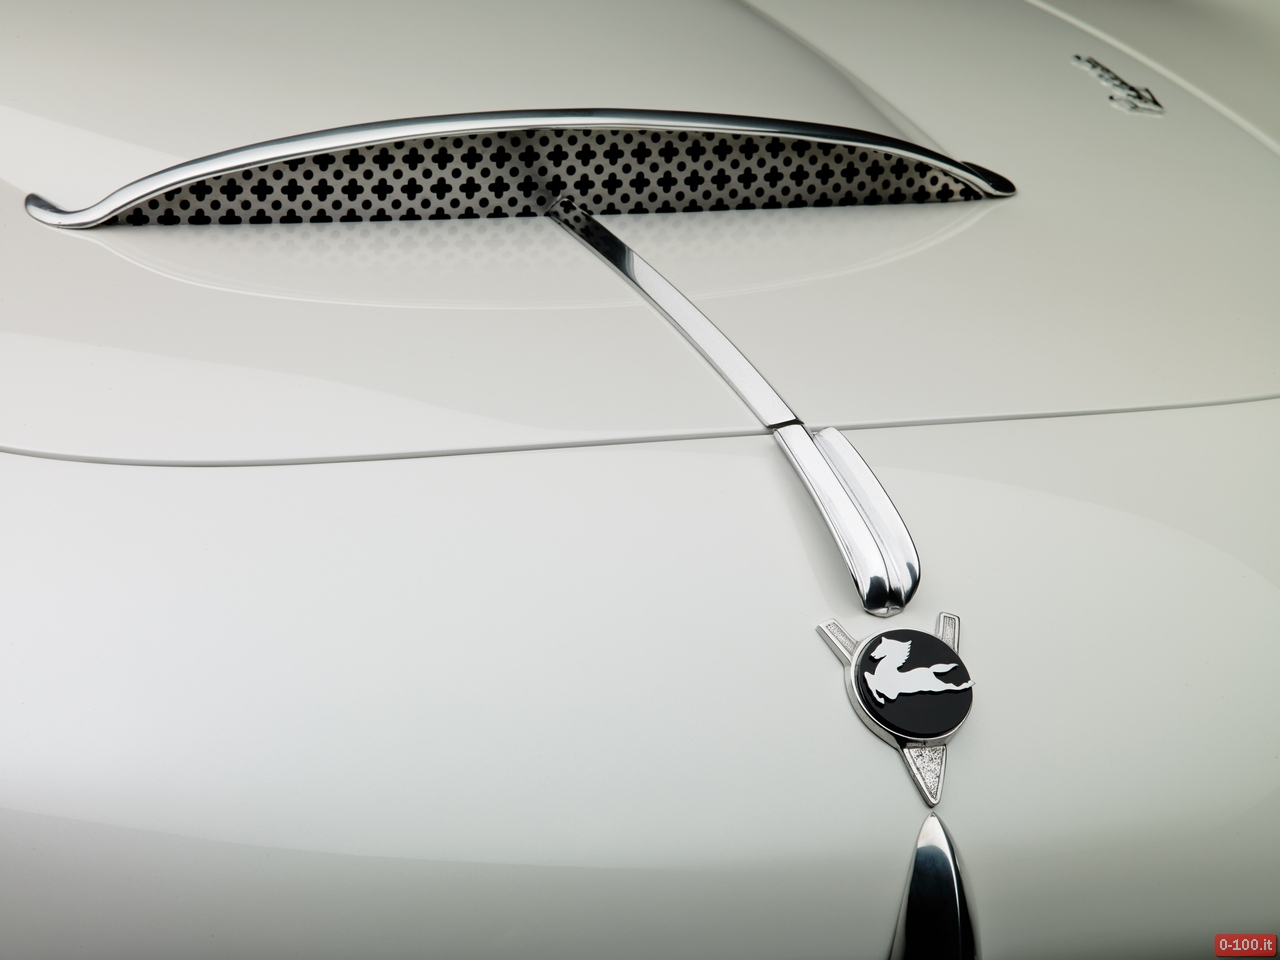 pegaso-z-102-berlinetta-serie-ii-by-carrosserie-j-saoutchik-rm-auctions_0-100_11